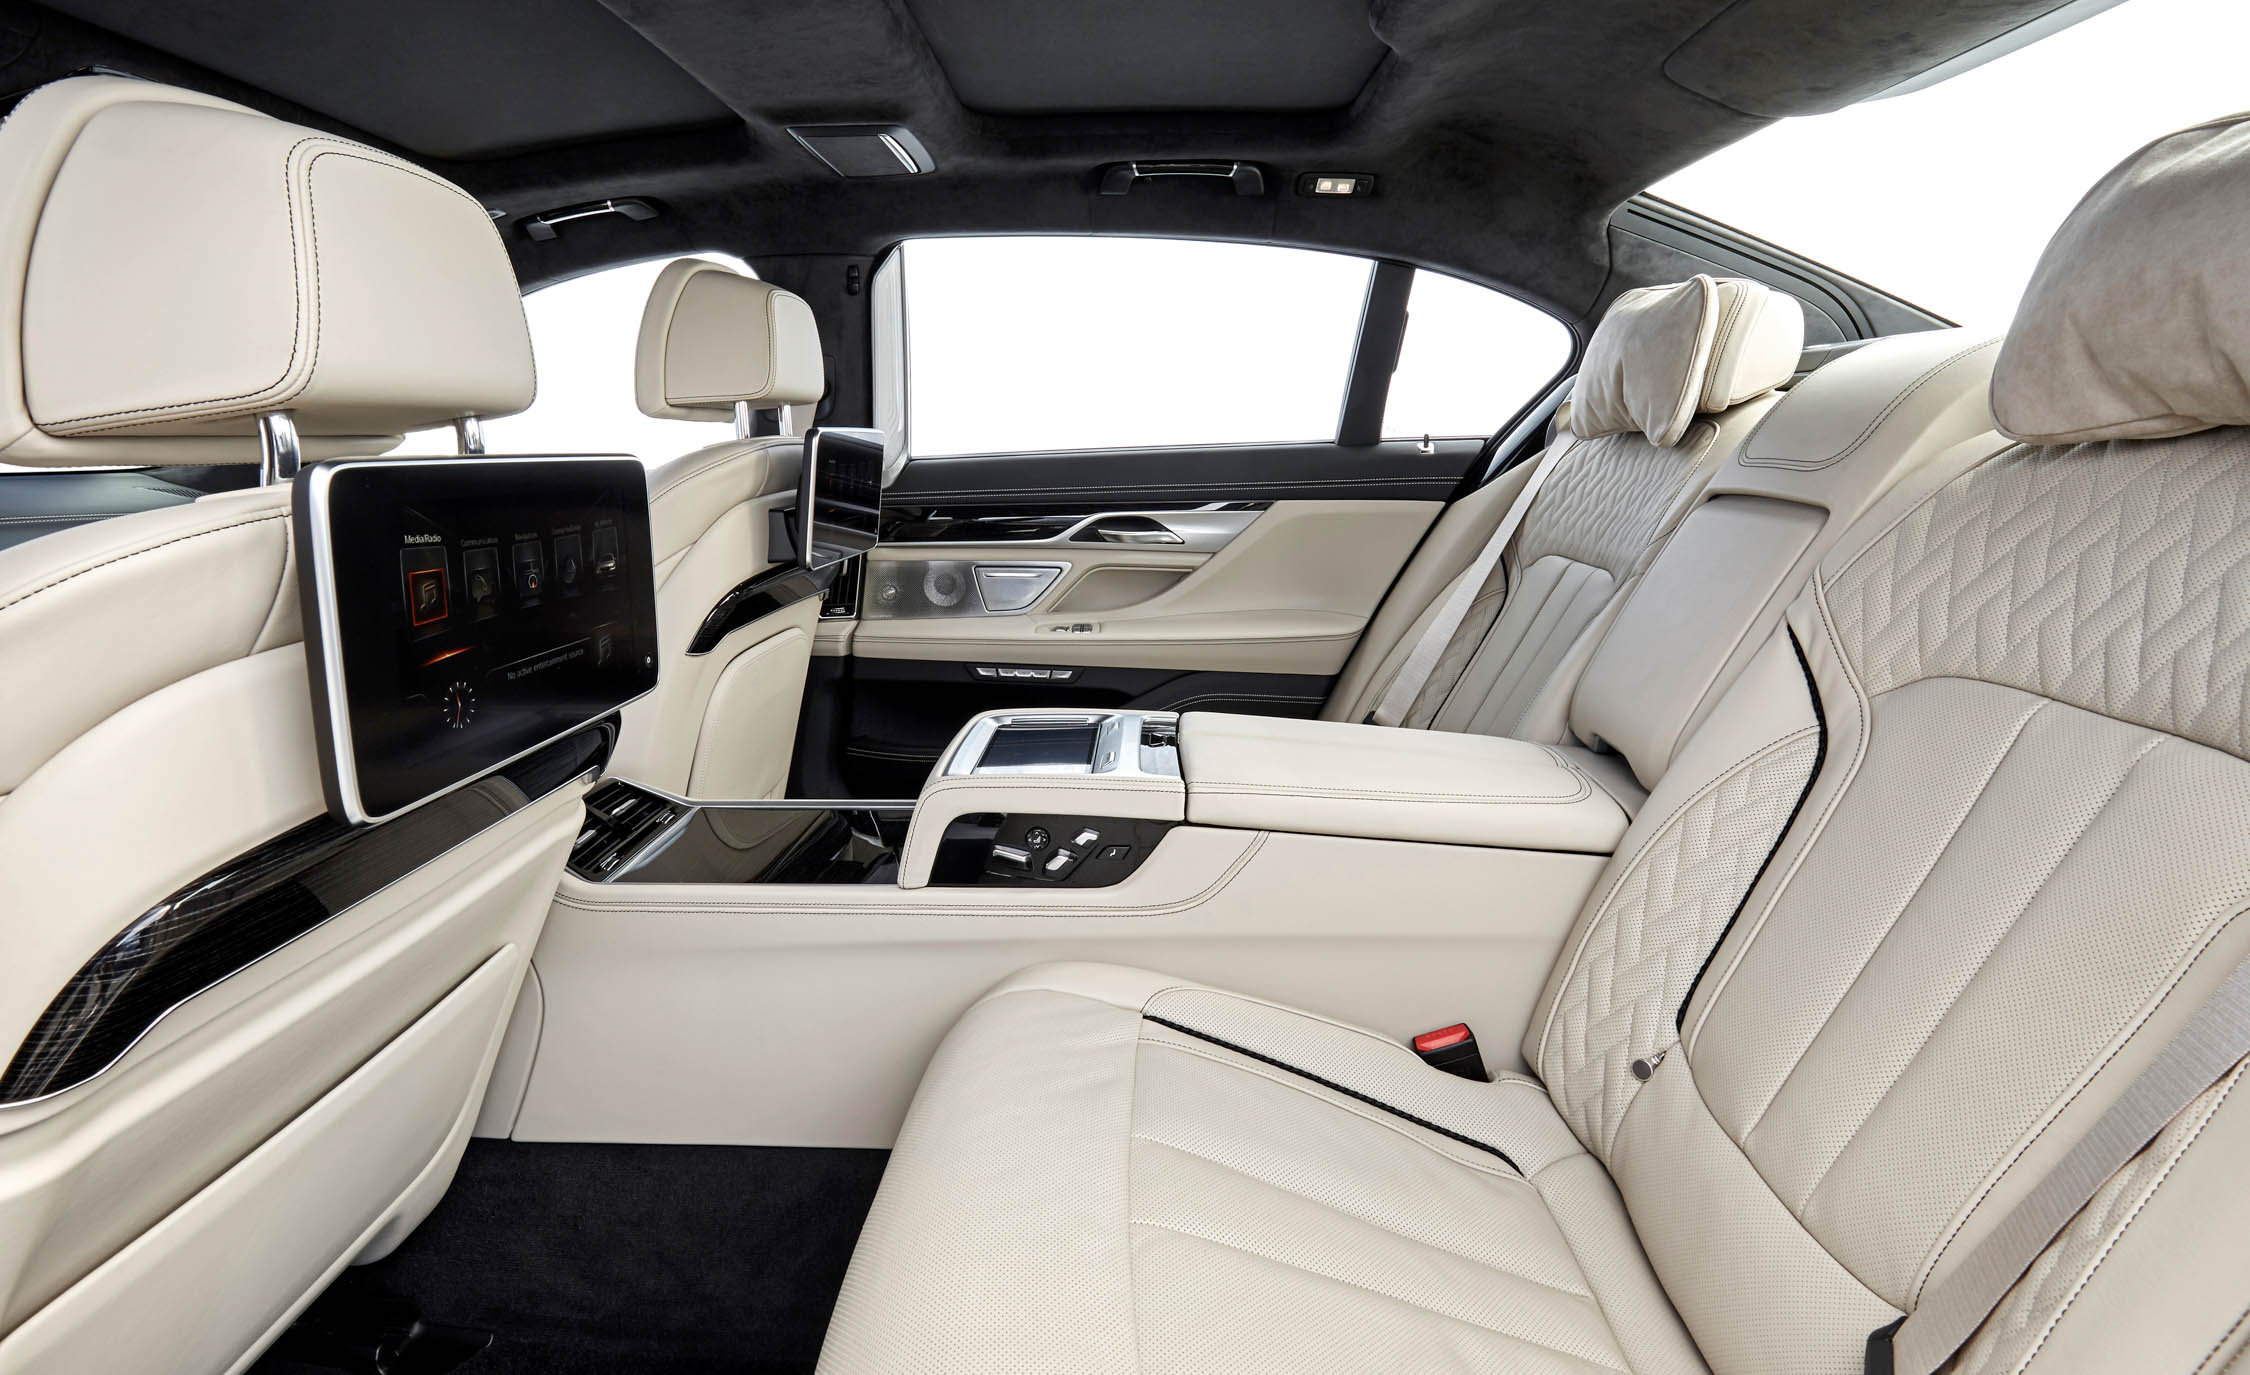 2017 BMW M760i XDrive Interior Seats Rear (View 53 of 76)